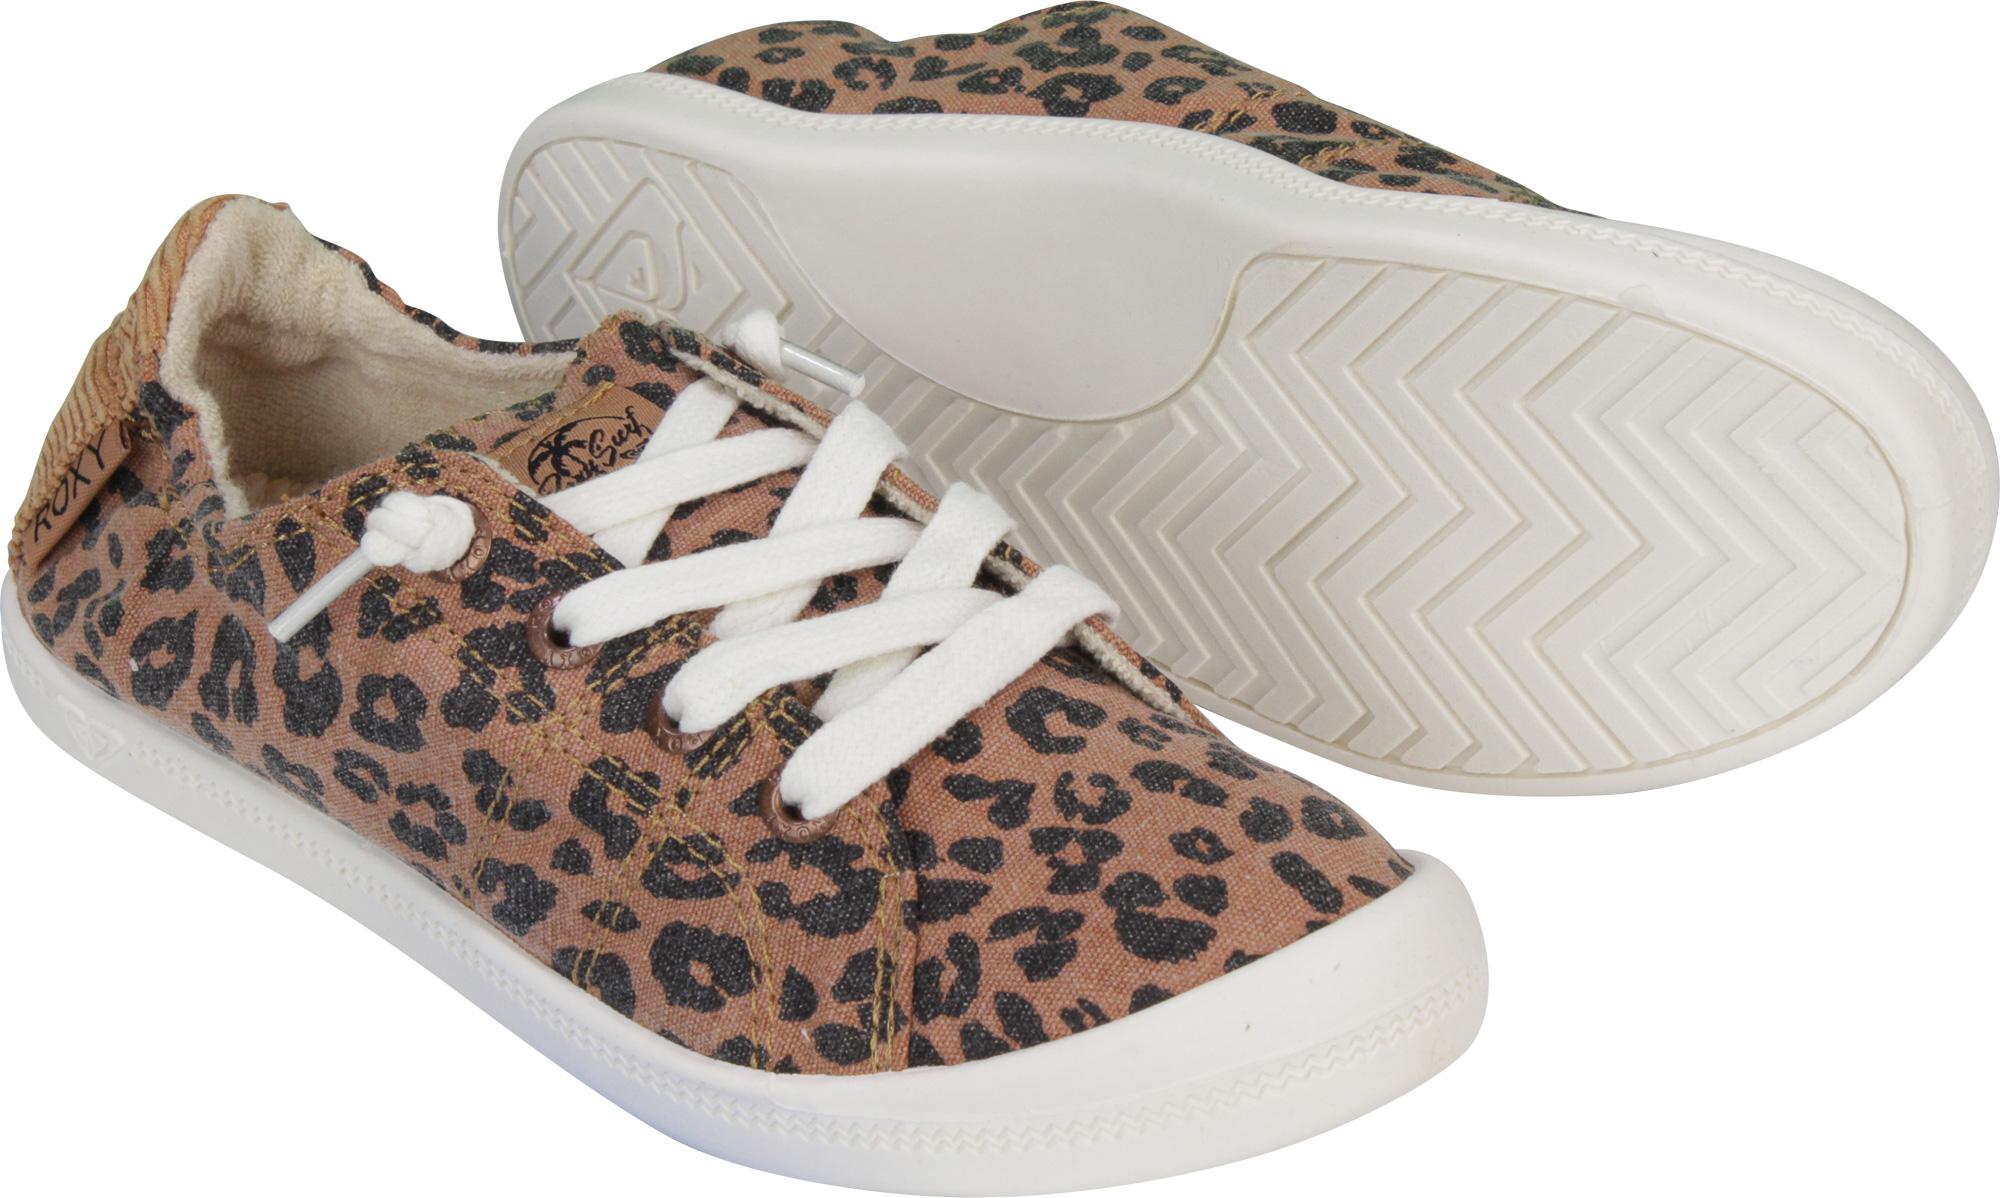 Roxy - Roxy Womens Bayshore III Shoes